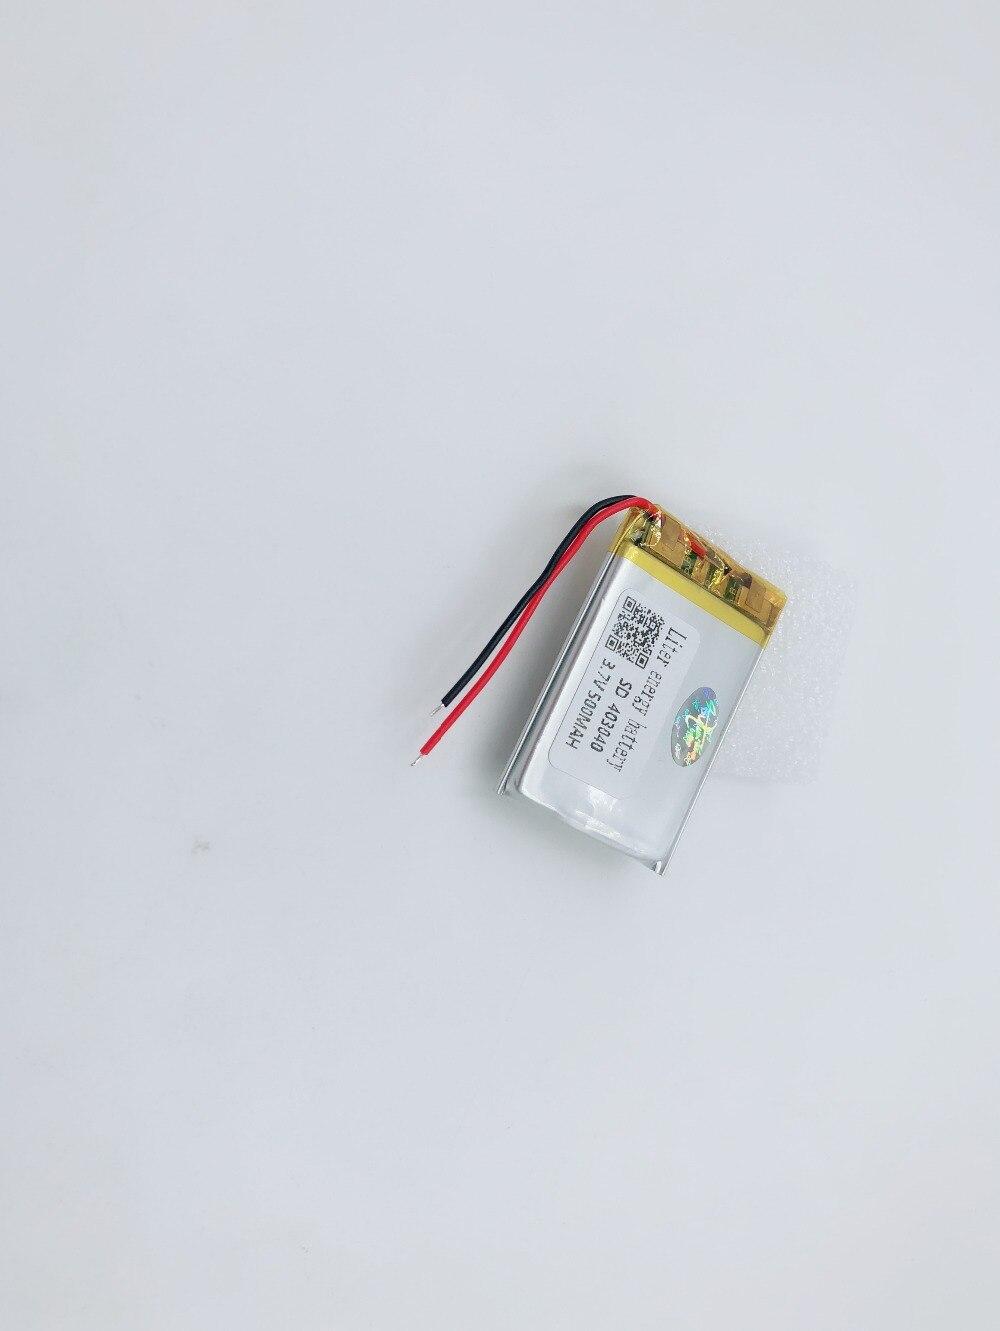 Batterien Initiative Polymer Lithium-ionen Batterie 3,7 V 500 Mah 403040 Liter Energie Batterie Ce Fcc Rohs Msds Qualität Zertifizierung